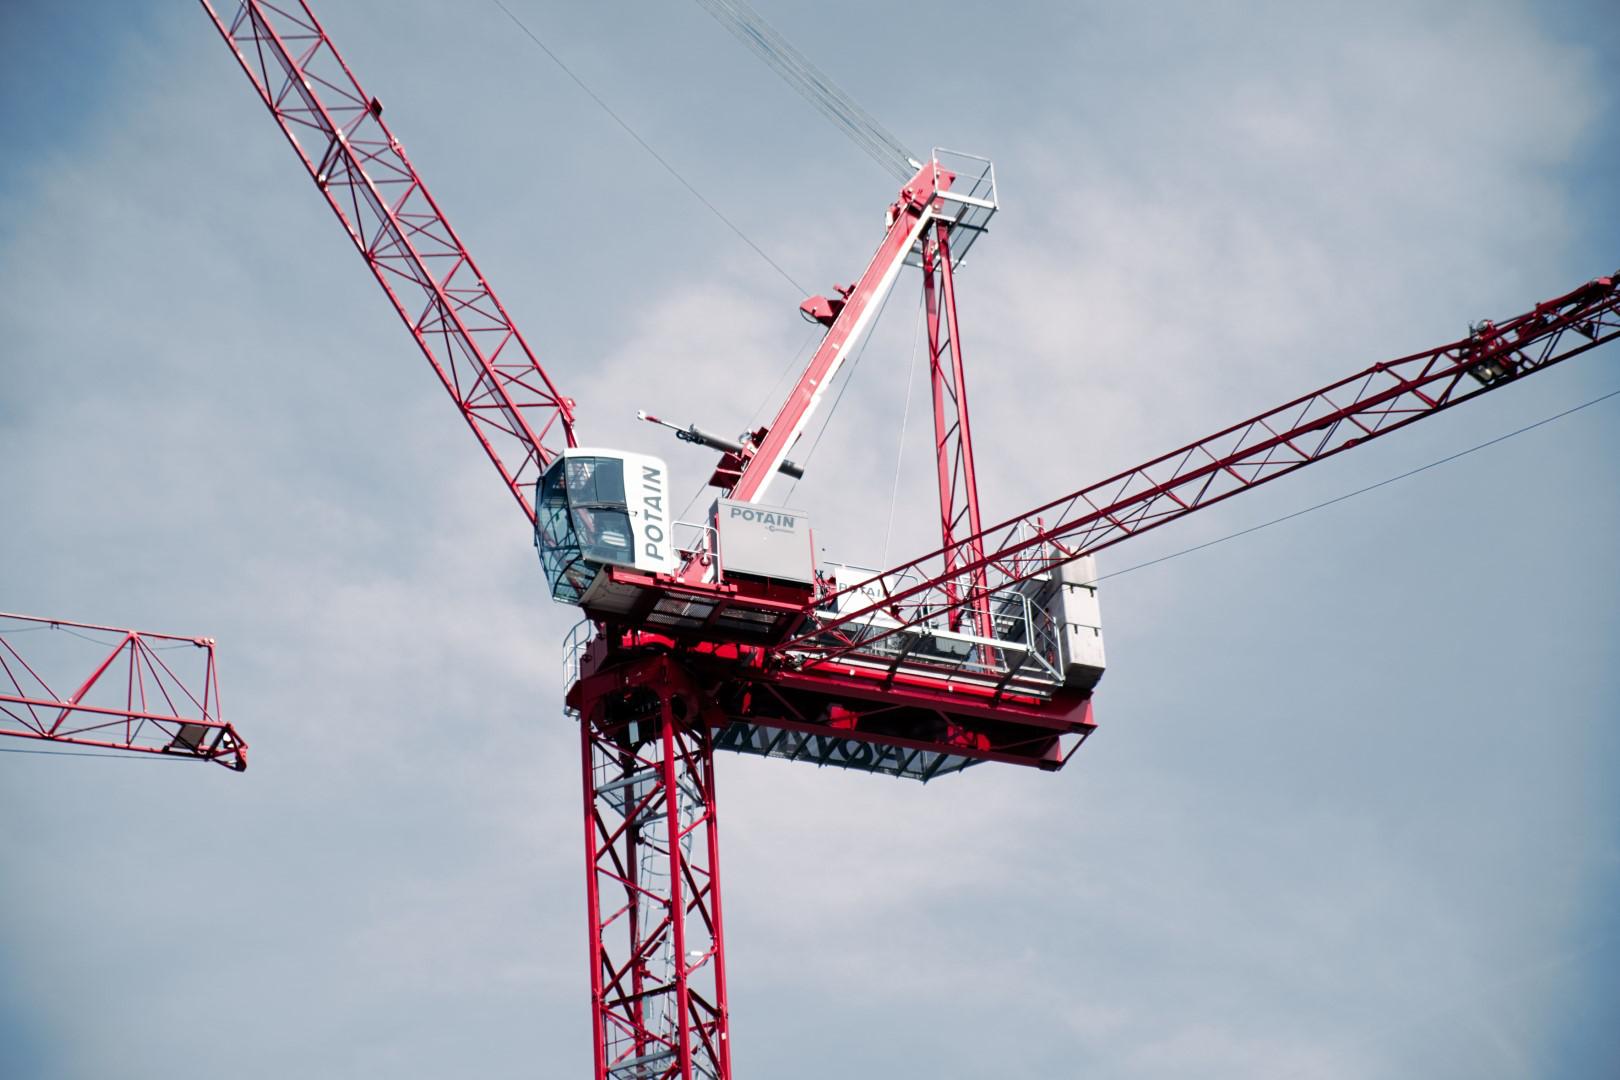 Manitowoc debuts Potain MR 160 C luffing jib tower crane